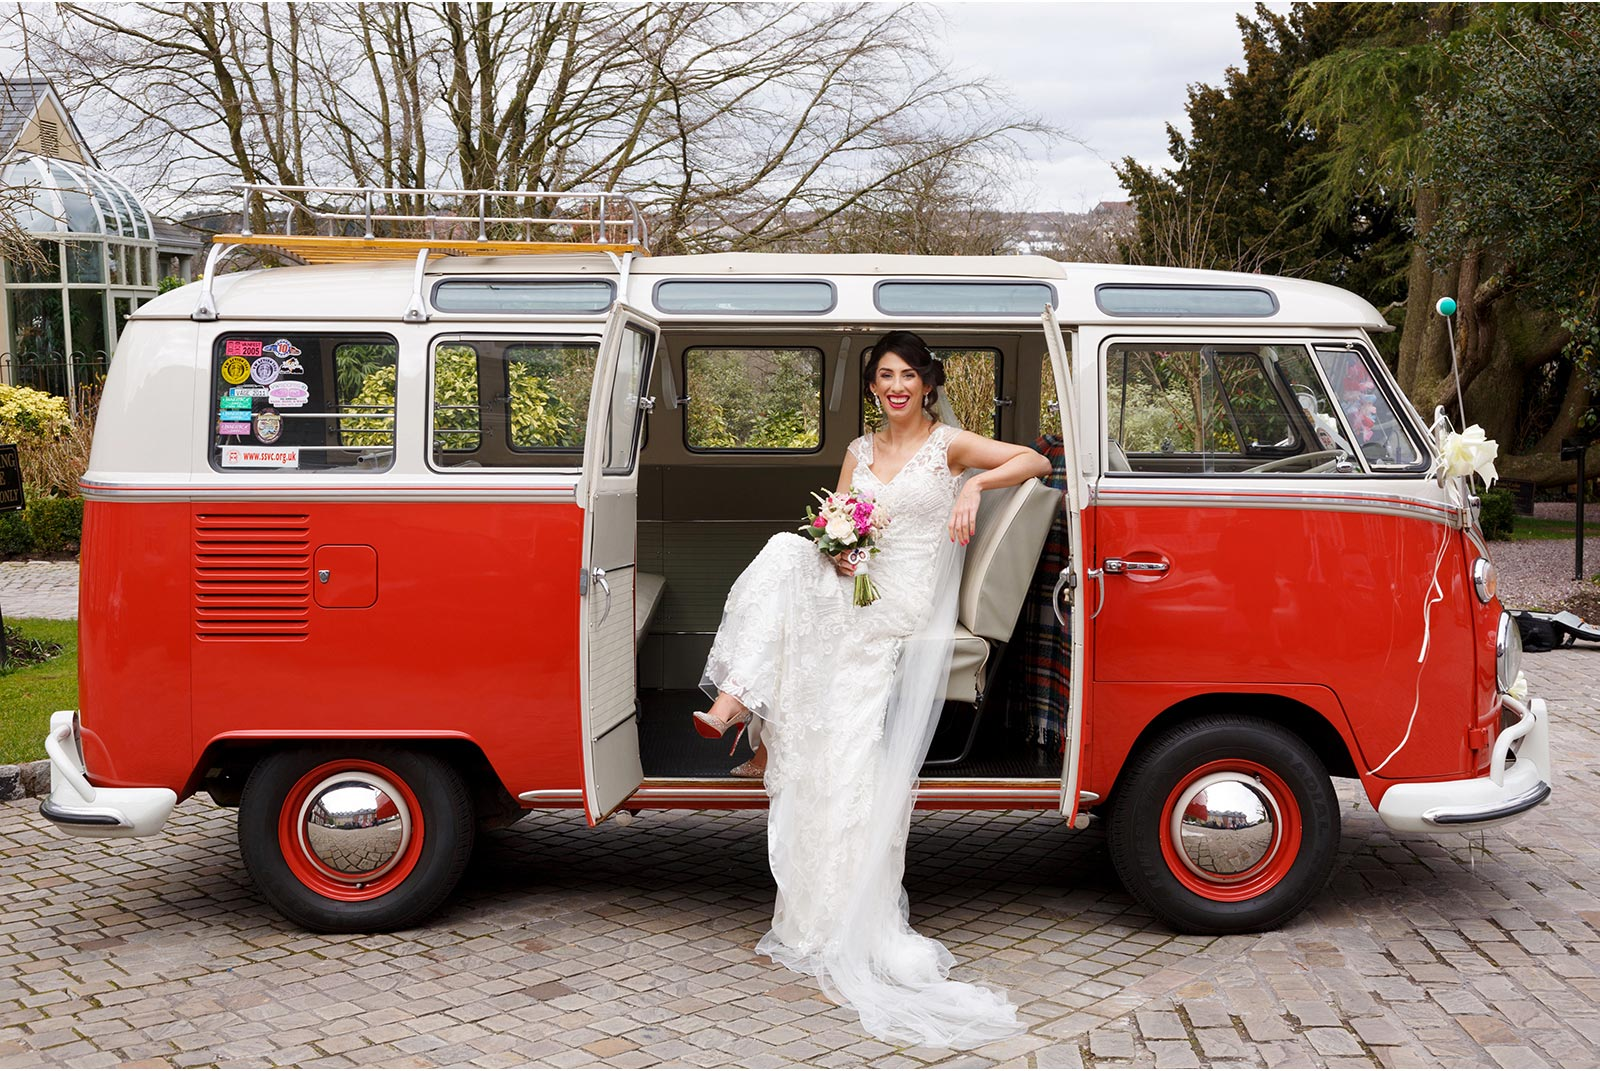 Bride enjoying her red VW camper wedding bus